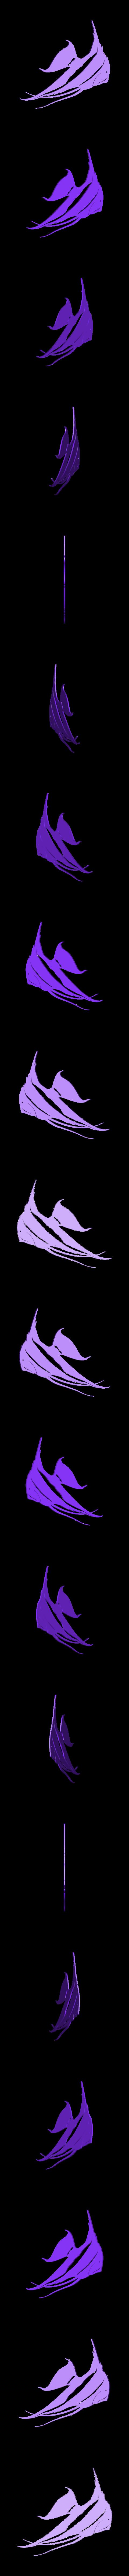 2_Angel_Single_1.stl Download STL file Angel fish wall art \ Decor • 3D printing object, 3dprintlines